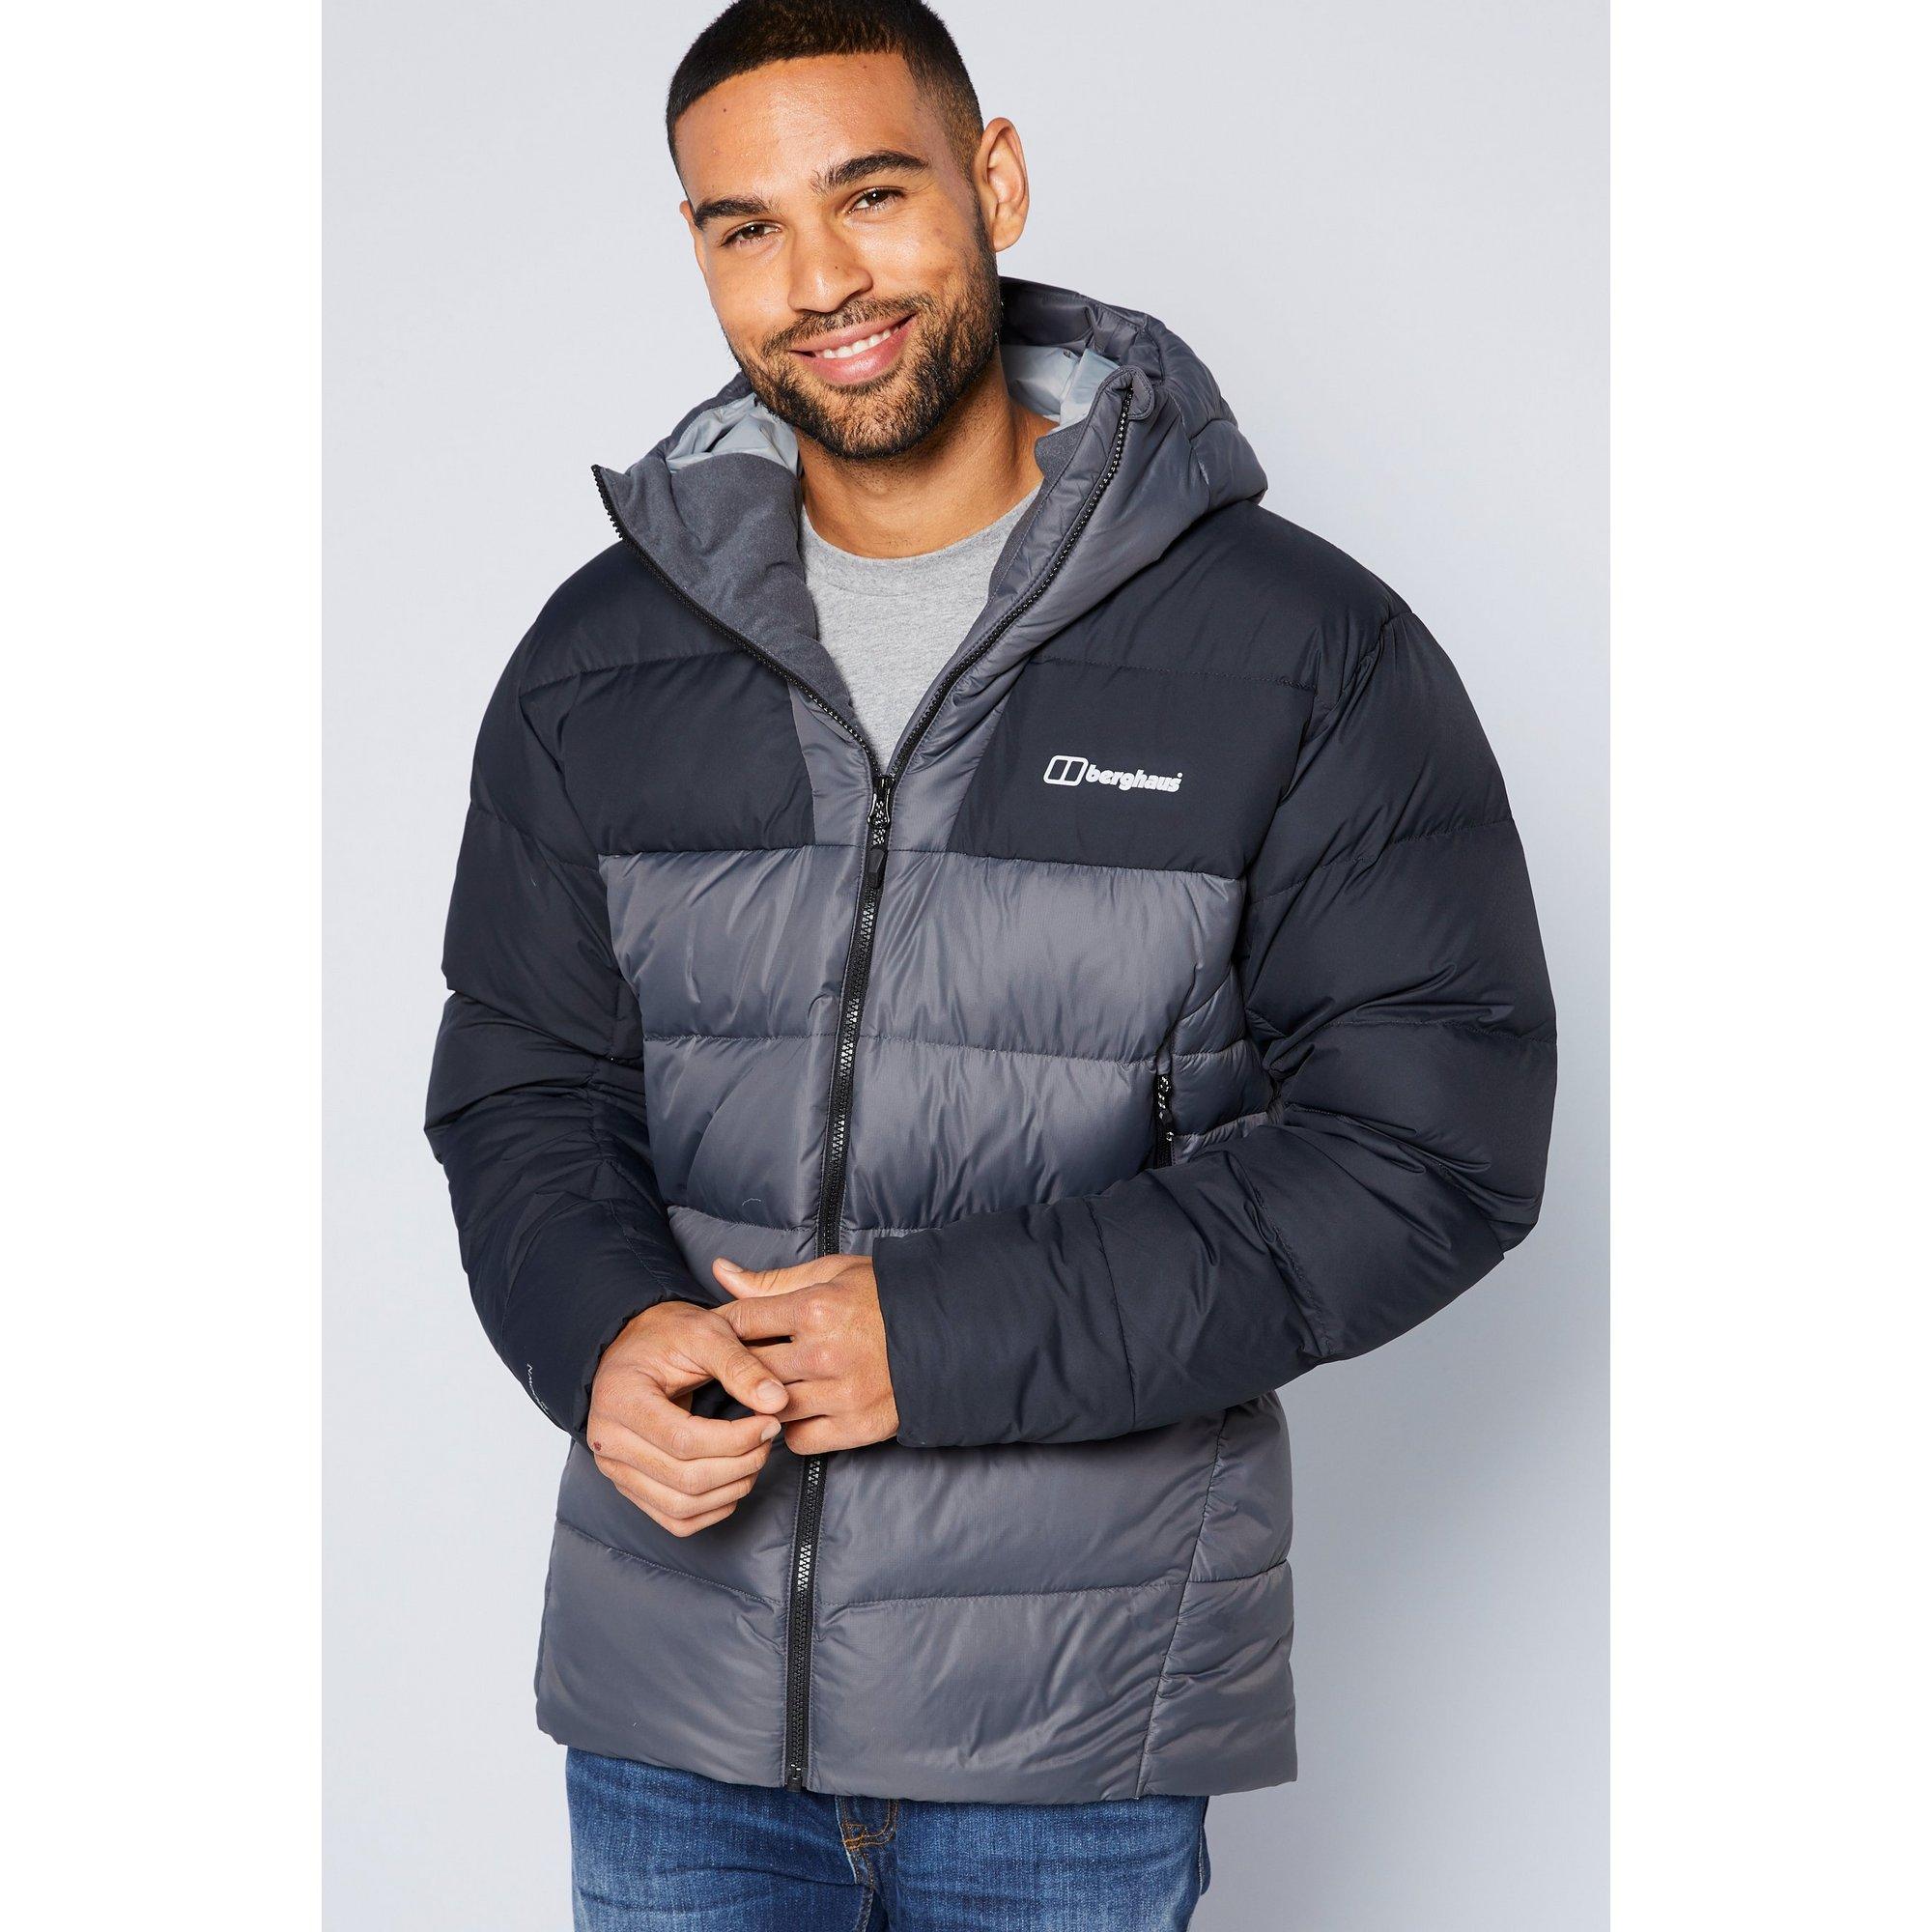 Image of Berghaus Grey and Black Ronnas Reflect Jacket